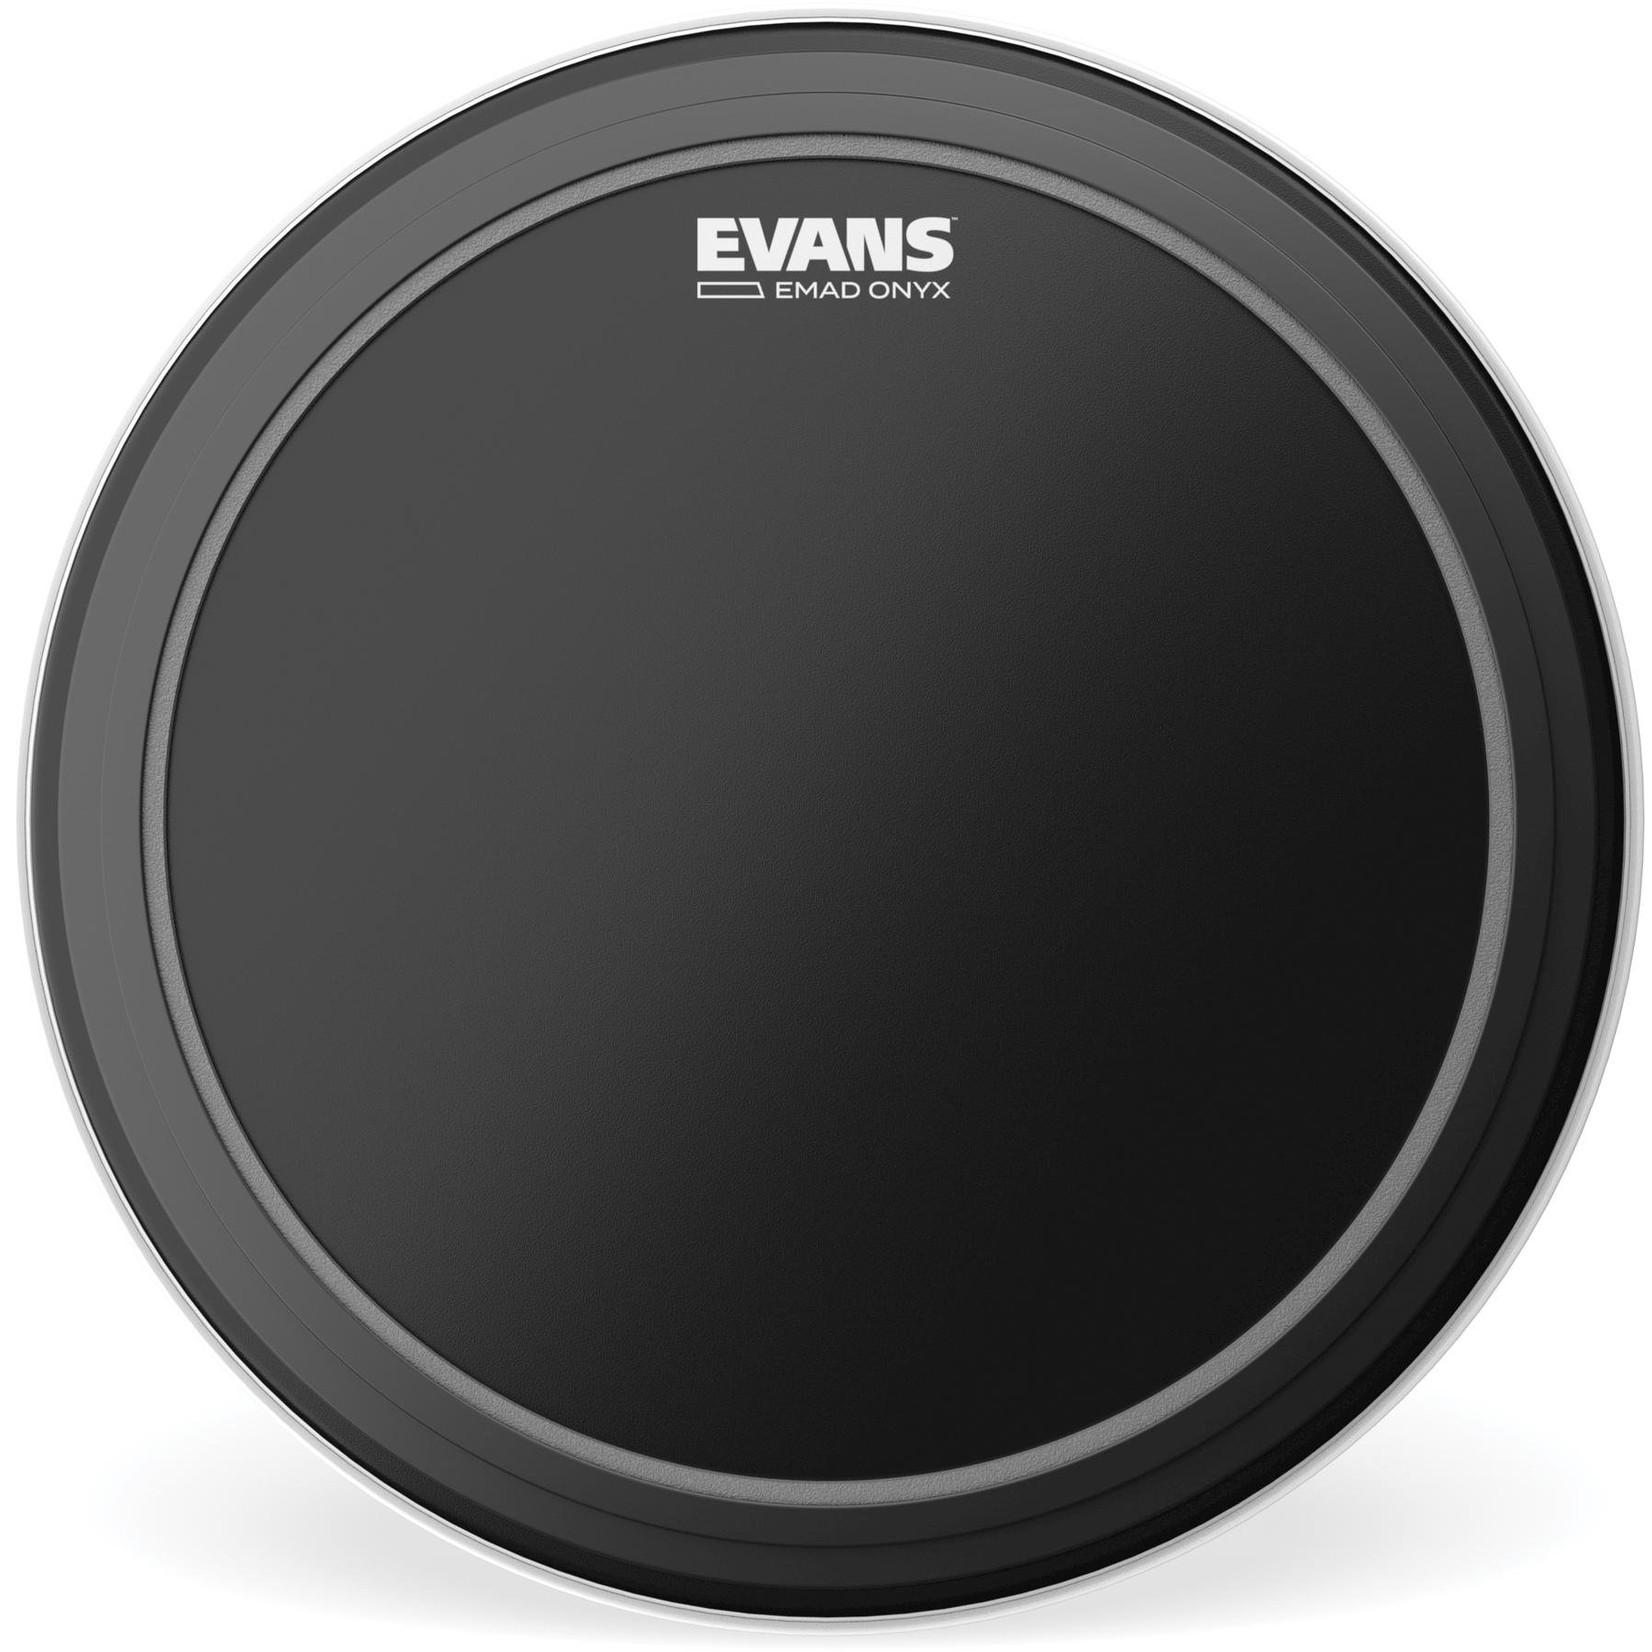 Evans Evans Onyx EMAD Bass Drum Batter